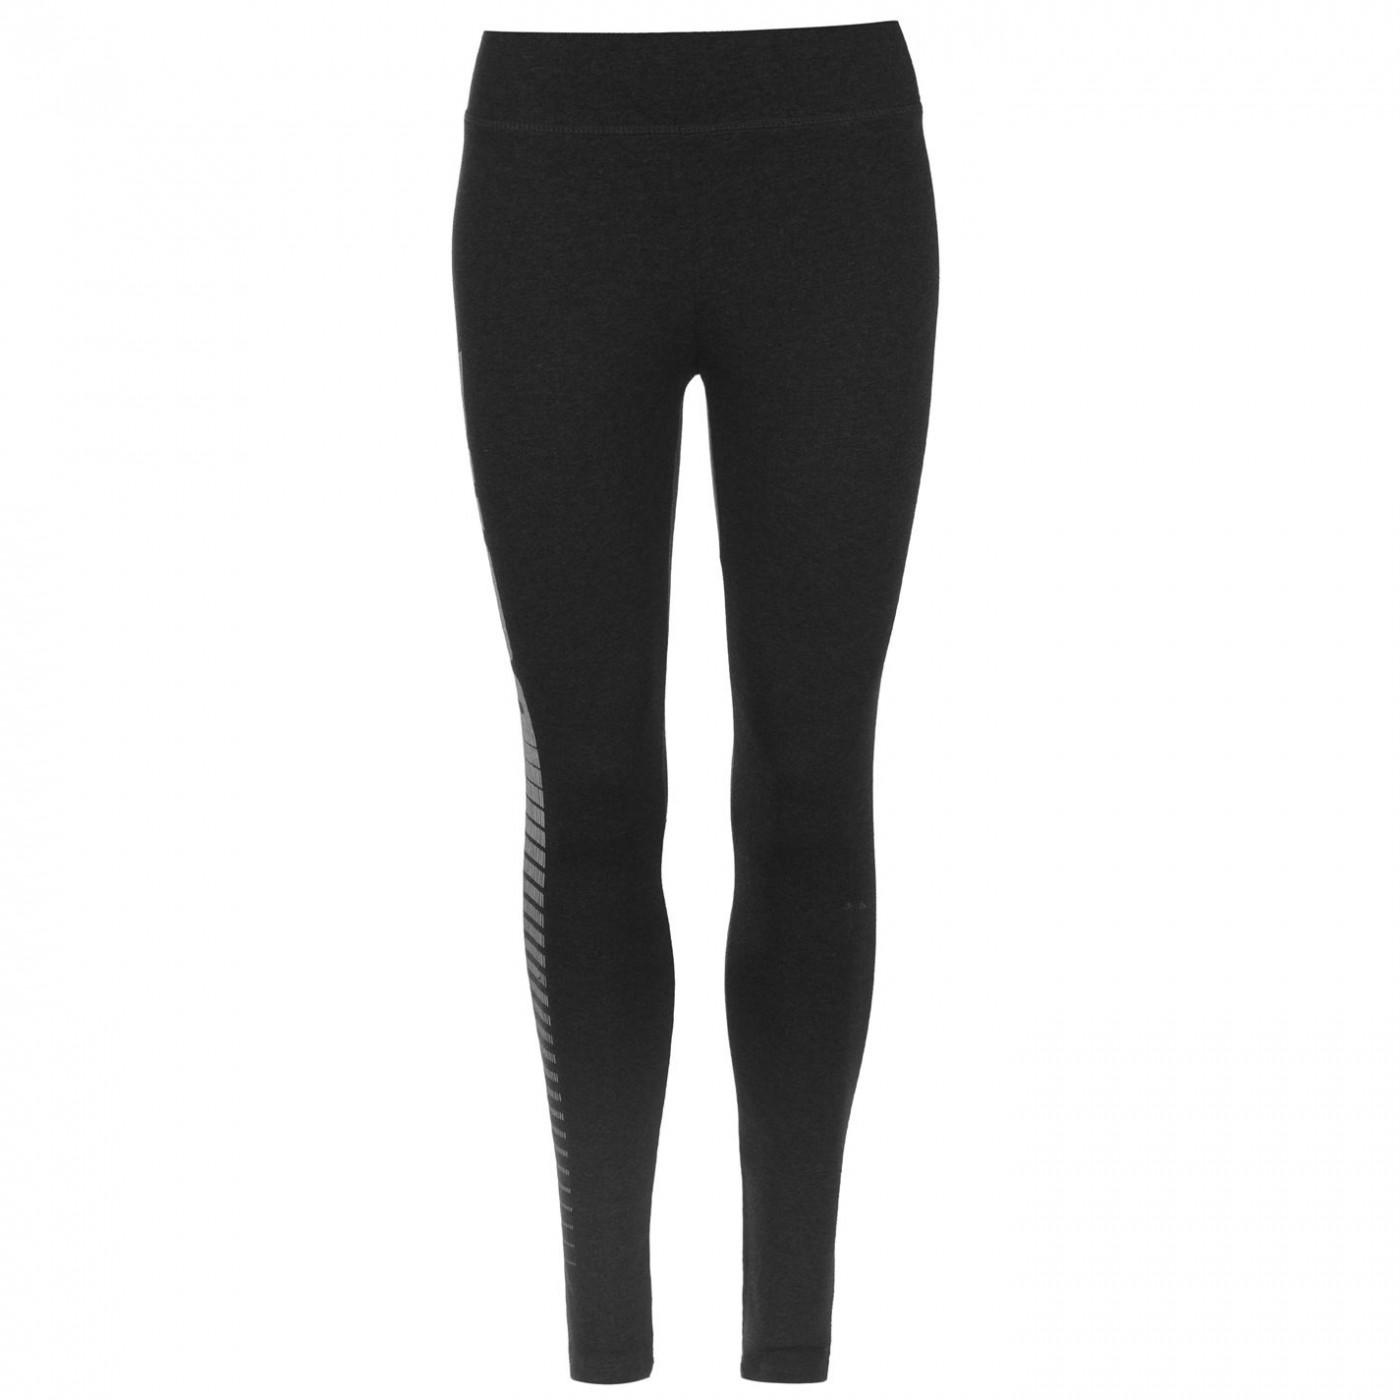 Women's Leggings Puma Sports